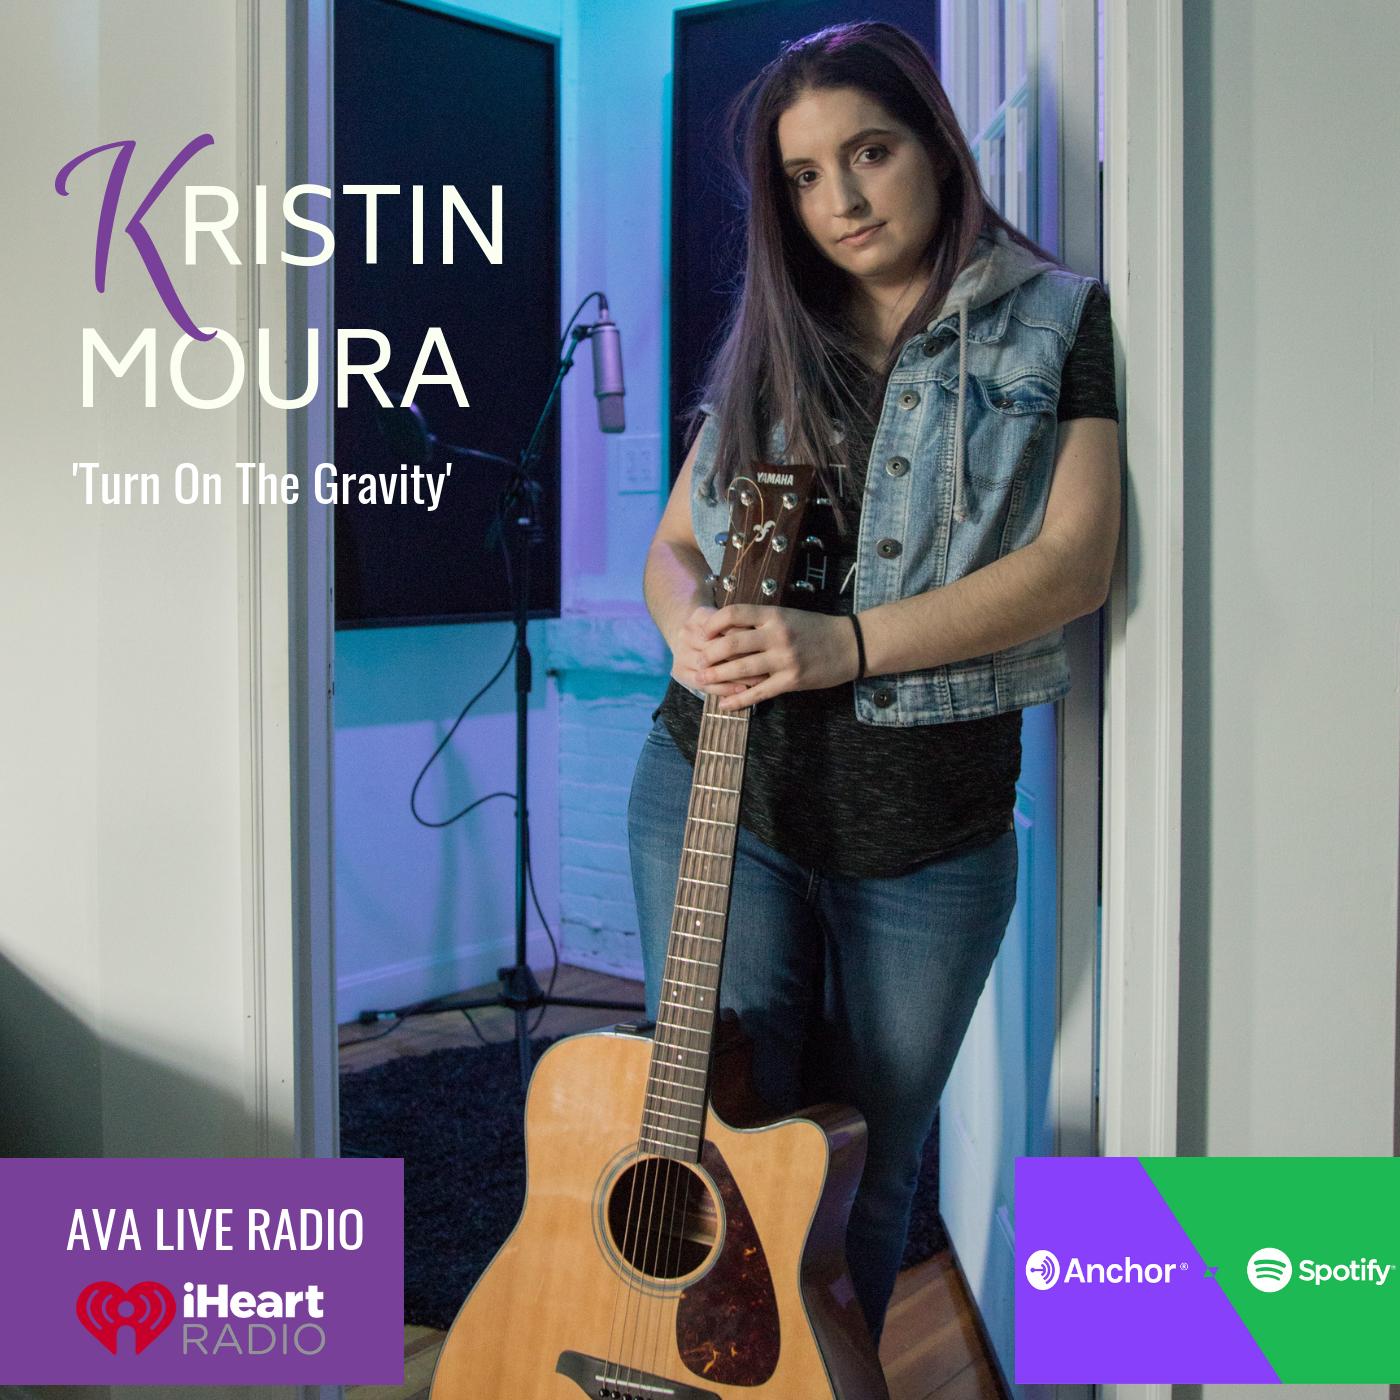 Kristin Moura avaliveradio NMM.png